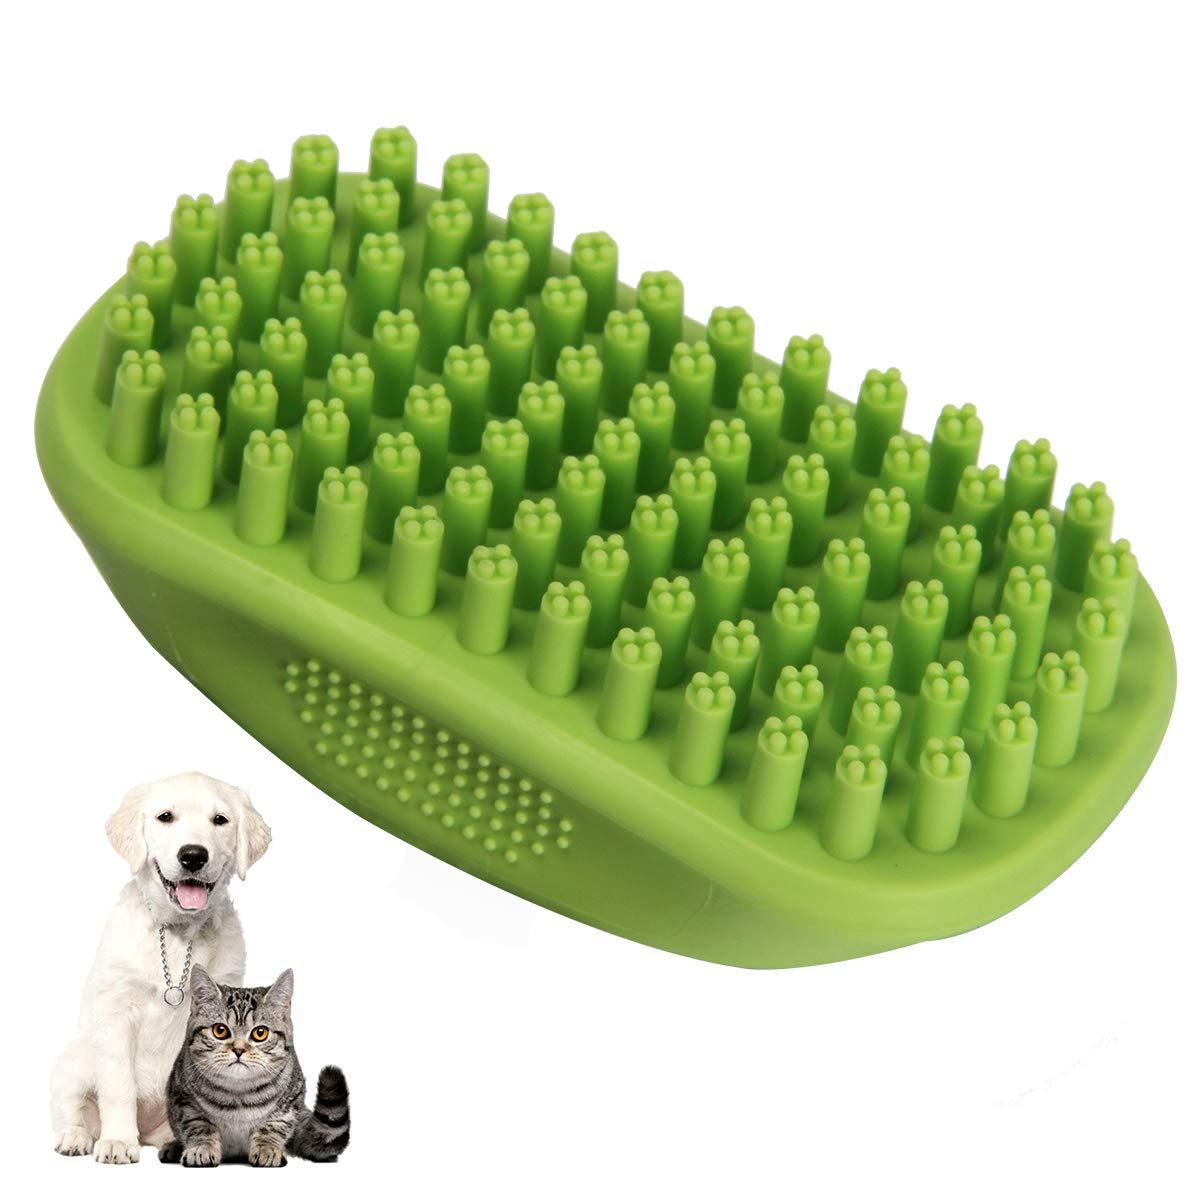 lcfun Pet Bath & Massage Brush Comb Great Grooming Tool Soft Rubber Bristles Long & Short Hair Medium Large Pets Dogs Cats Shampooing Shower